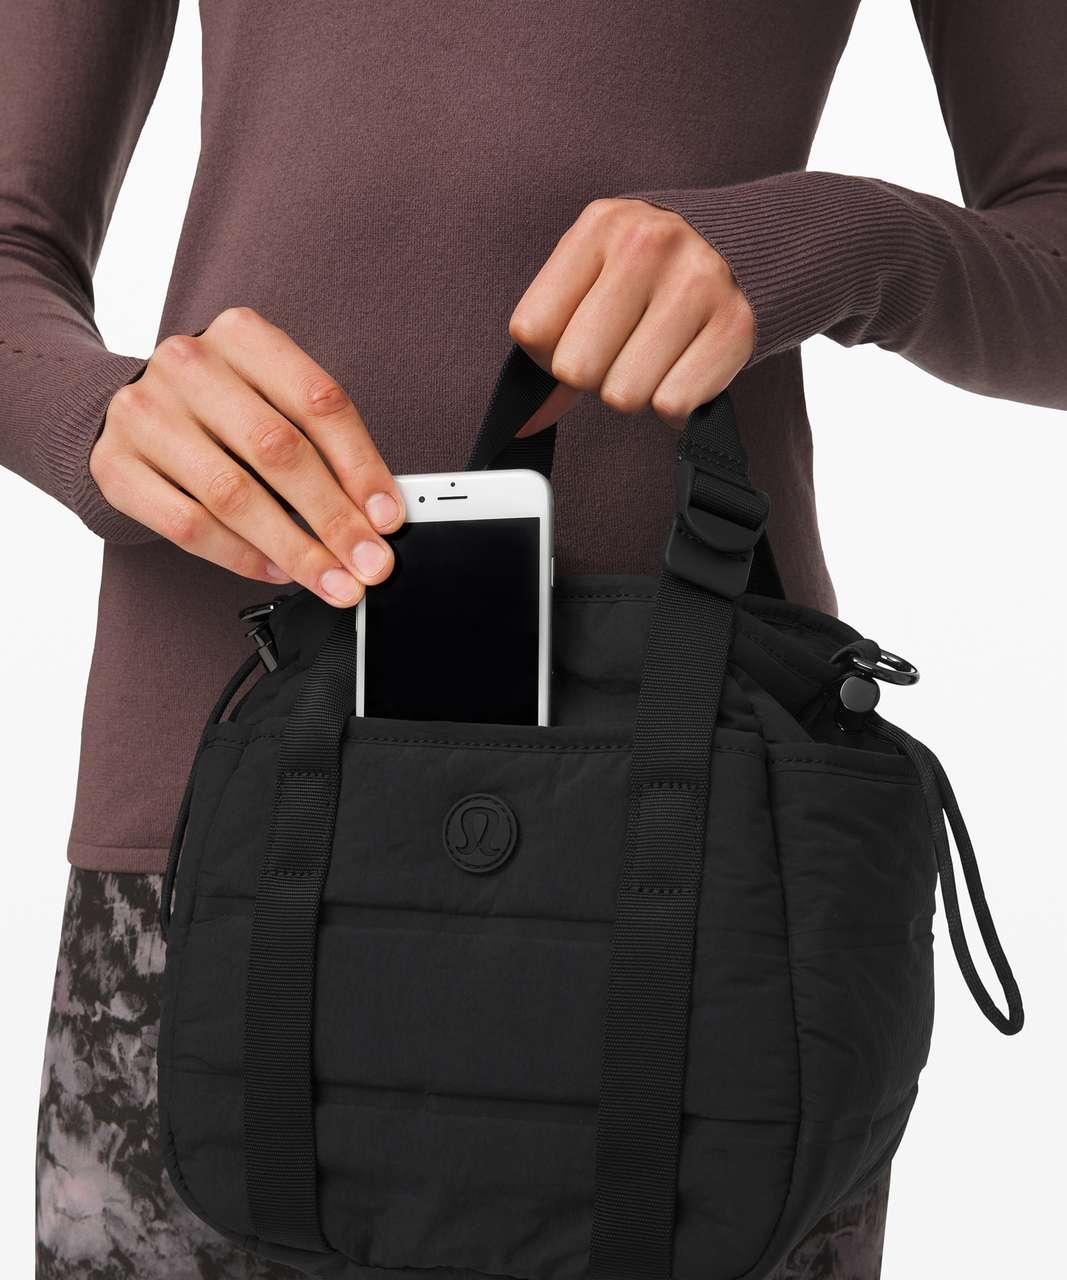 Lululemon Dash All Day Bucket Bag *6.5L - Black (First Release)